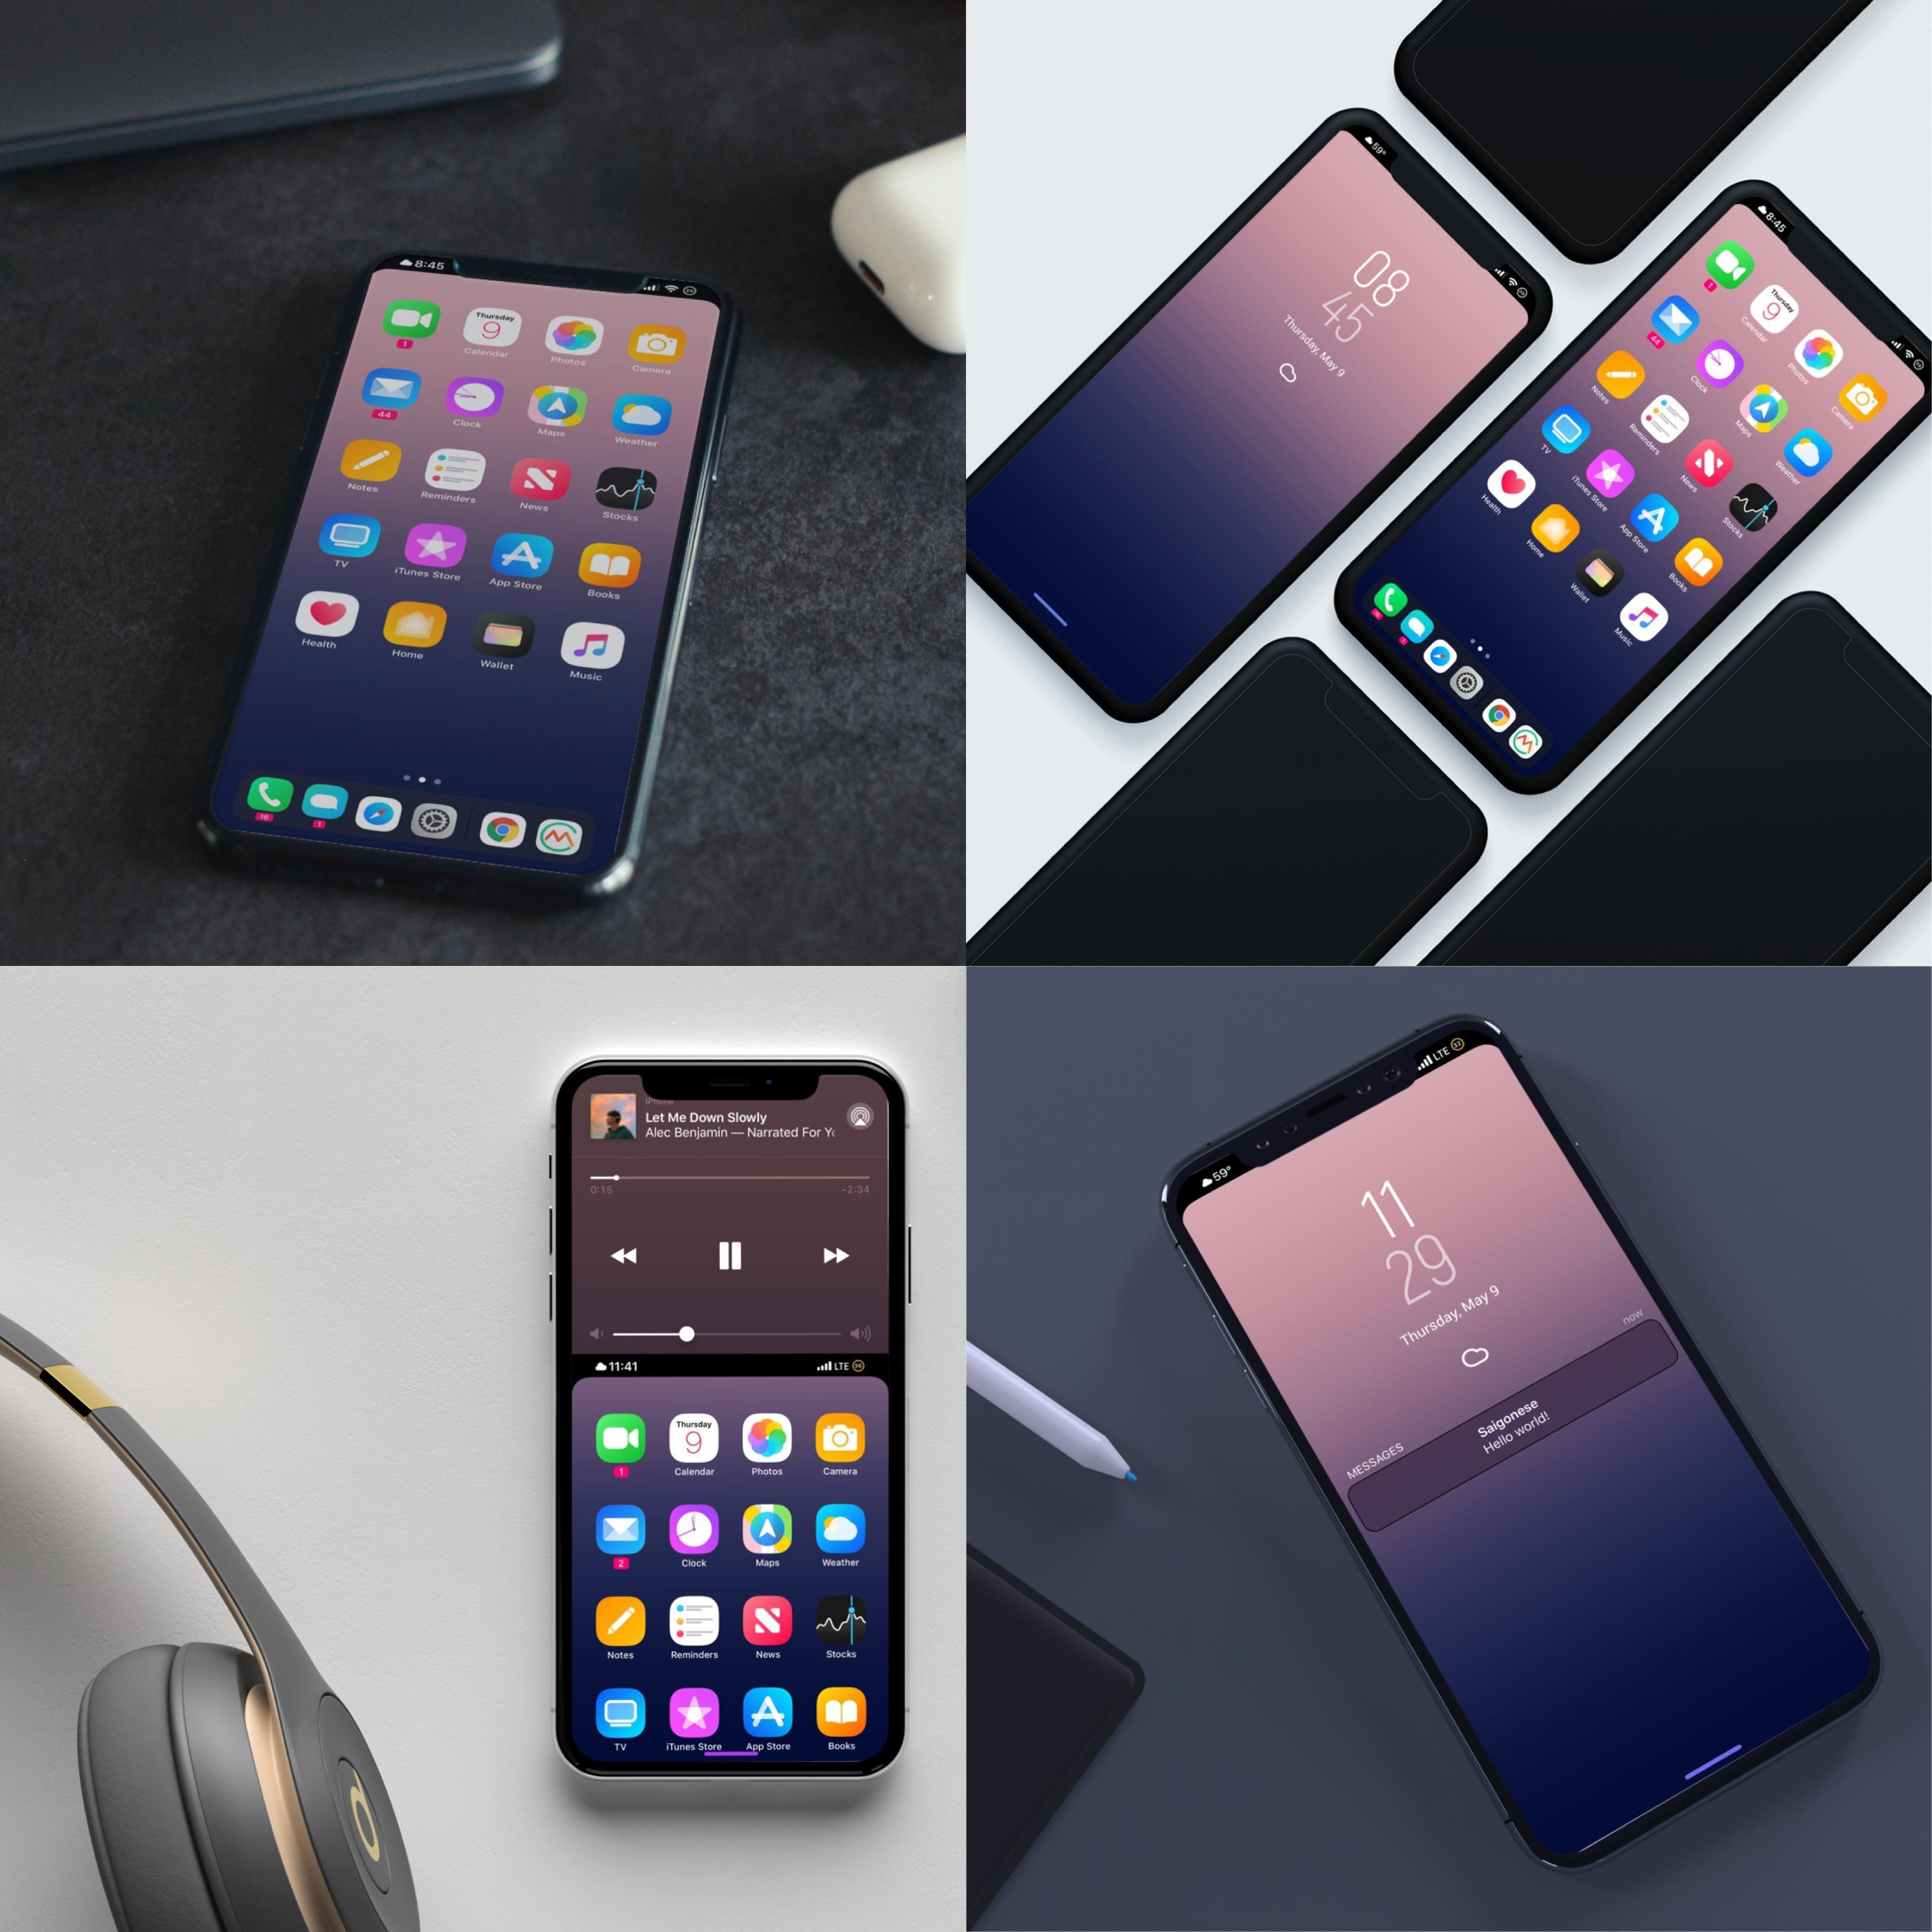 Notchless Wallpaper Iphone X Setup From Dusk Till Dawn Iosthemes